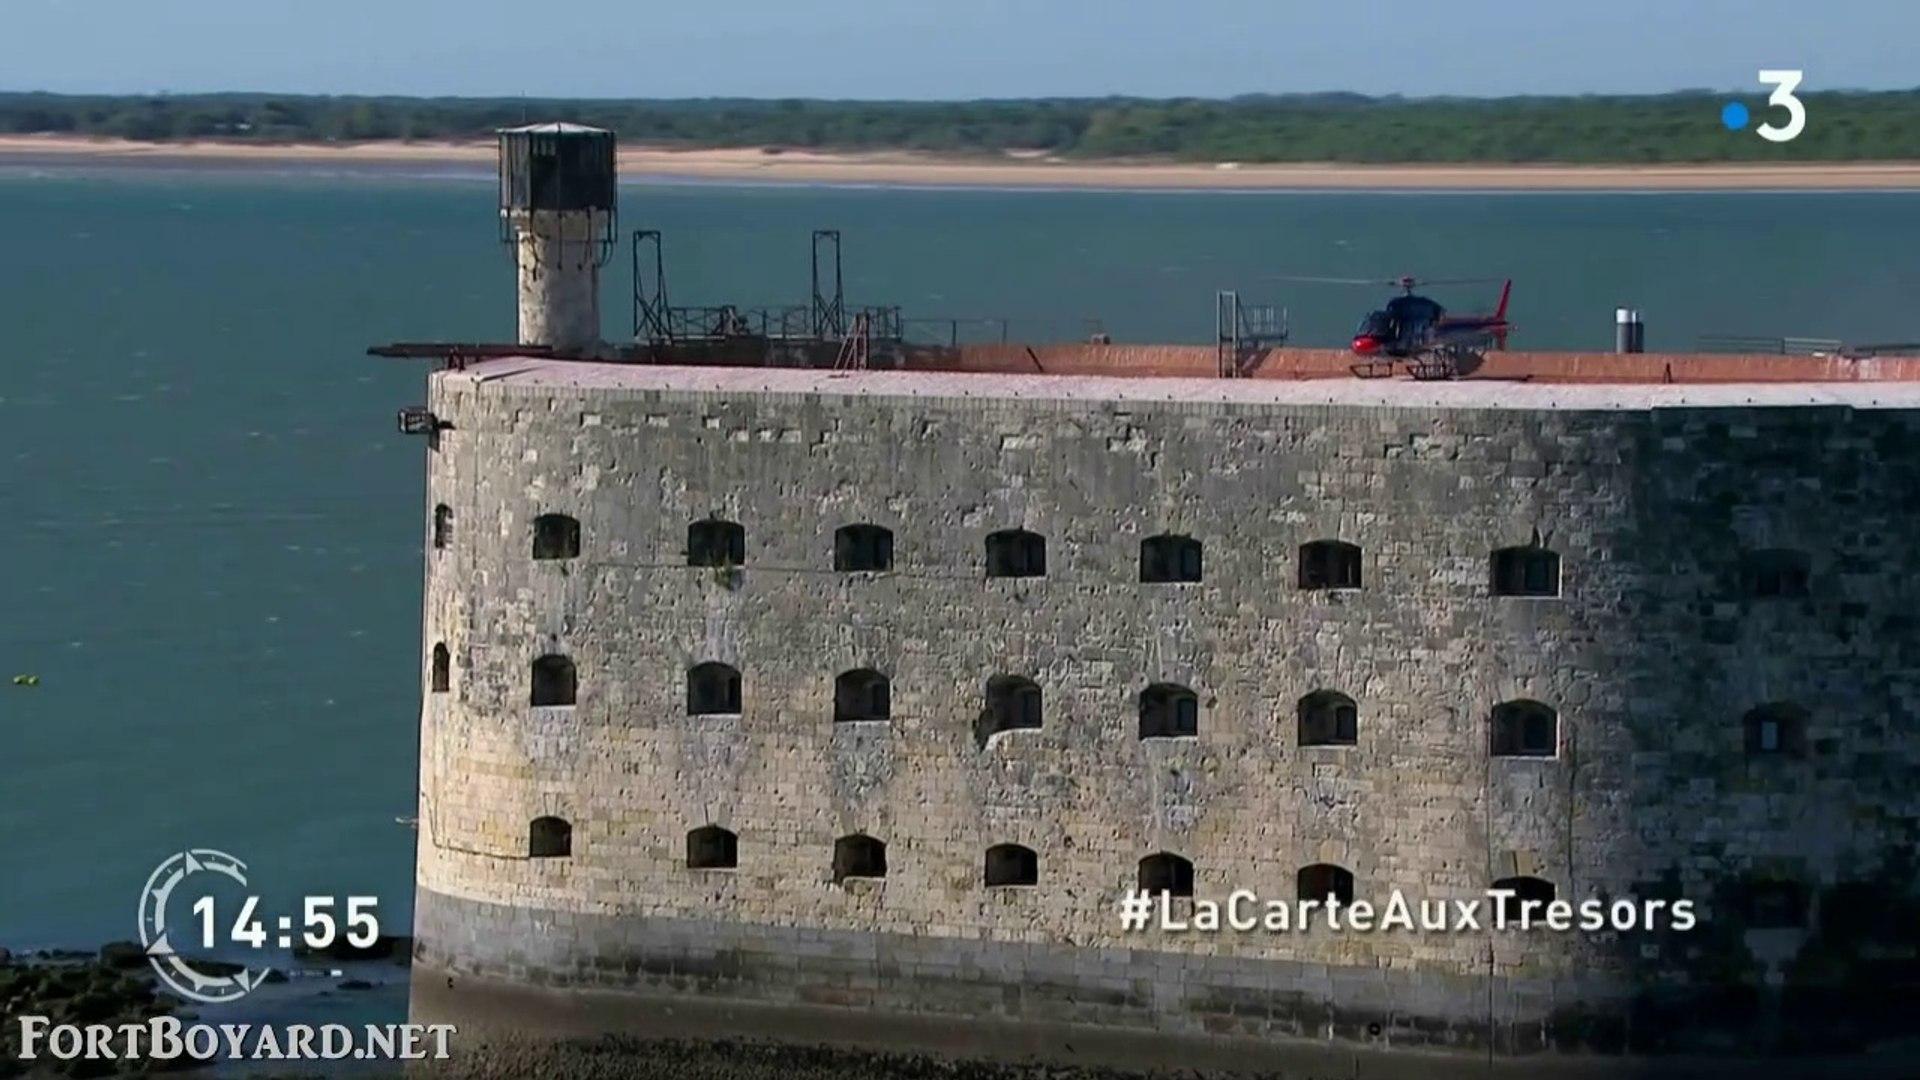 Carte Au Tresor Fort Boyard.La Carte Aux Tresors Charente Maritime Escale A Fort Boyard Enigme 3 France 3 17 Avril 2019